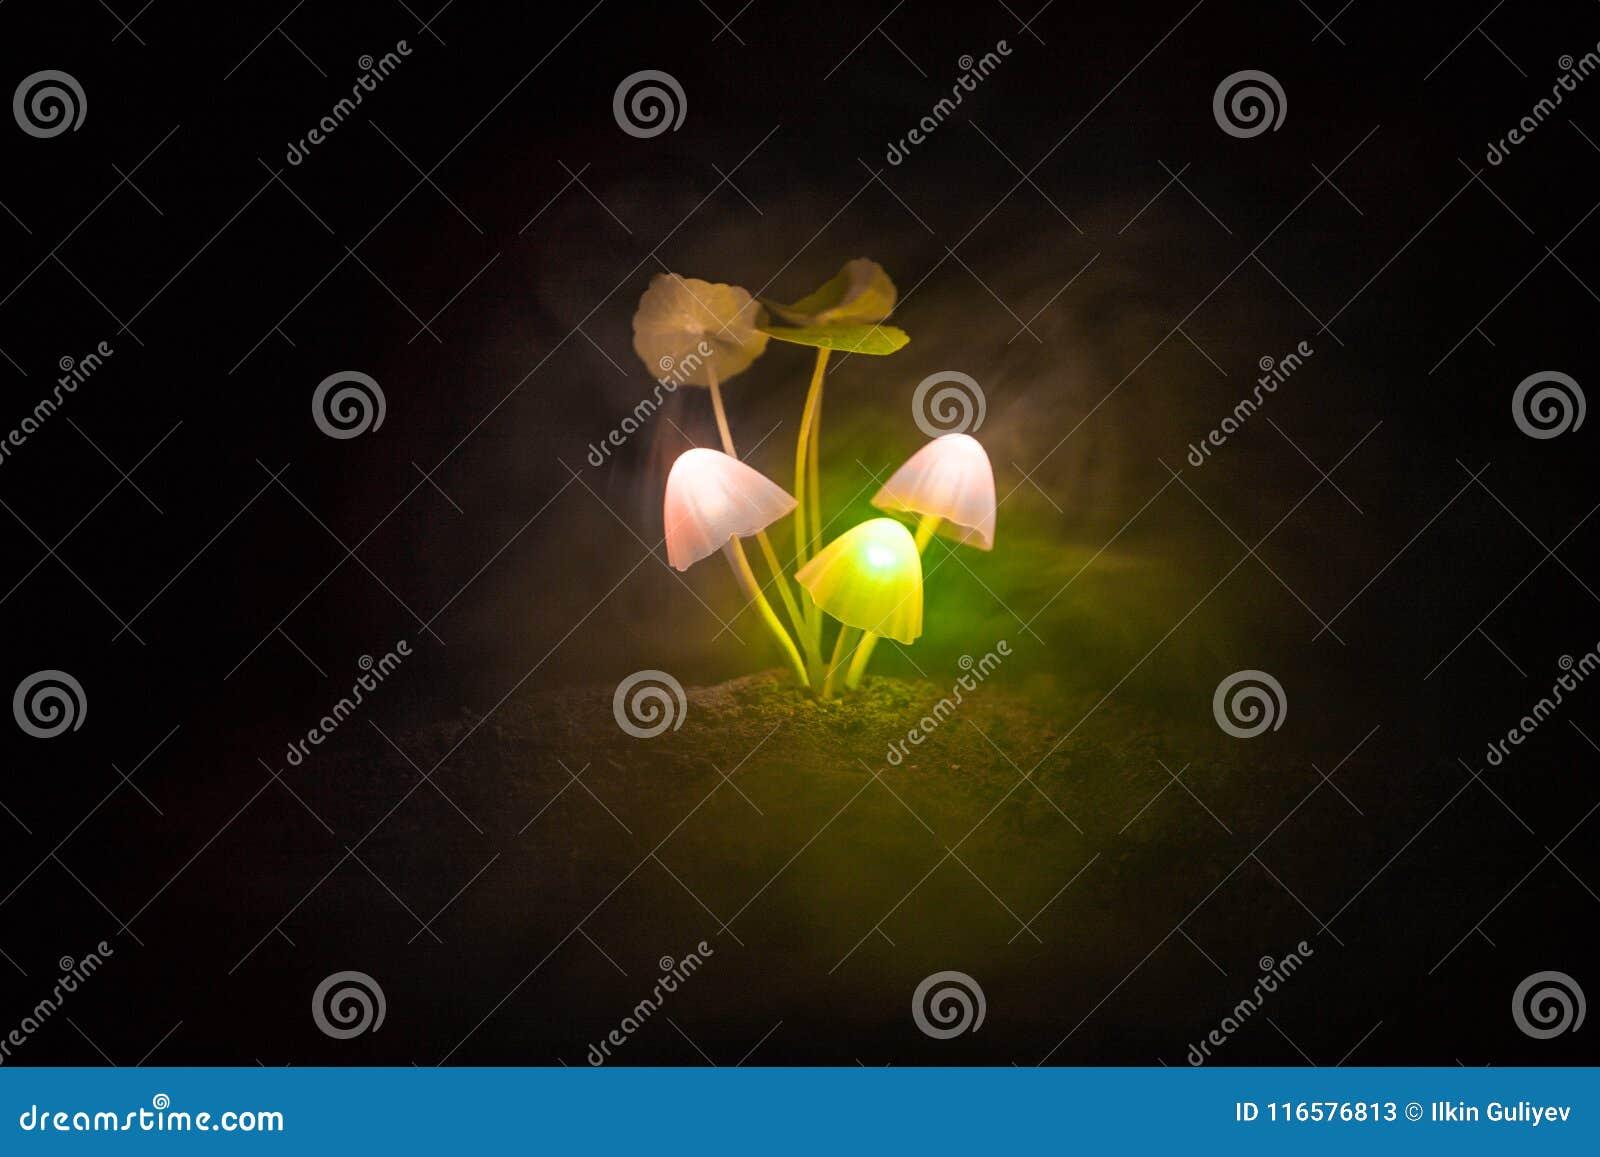 Three fantasy glowing mushrooms in mystery dark forest close-up. Beautiful macro shot of magic mushroom or three souls lost in ava